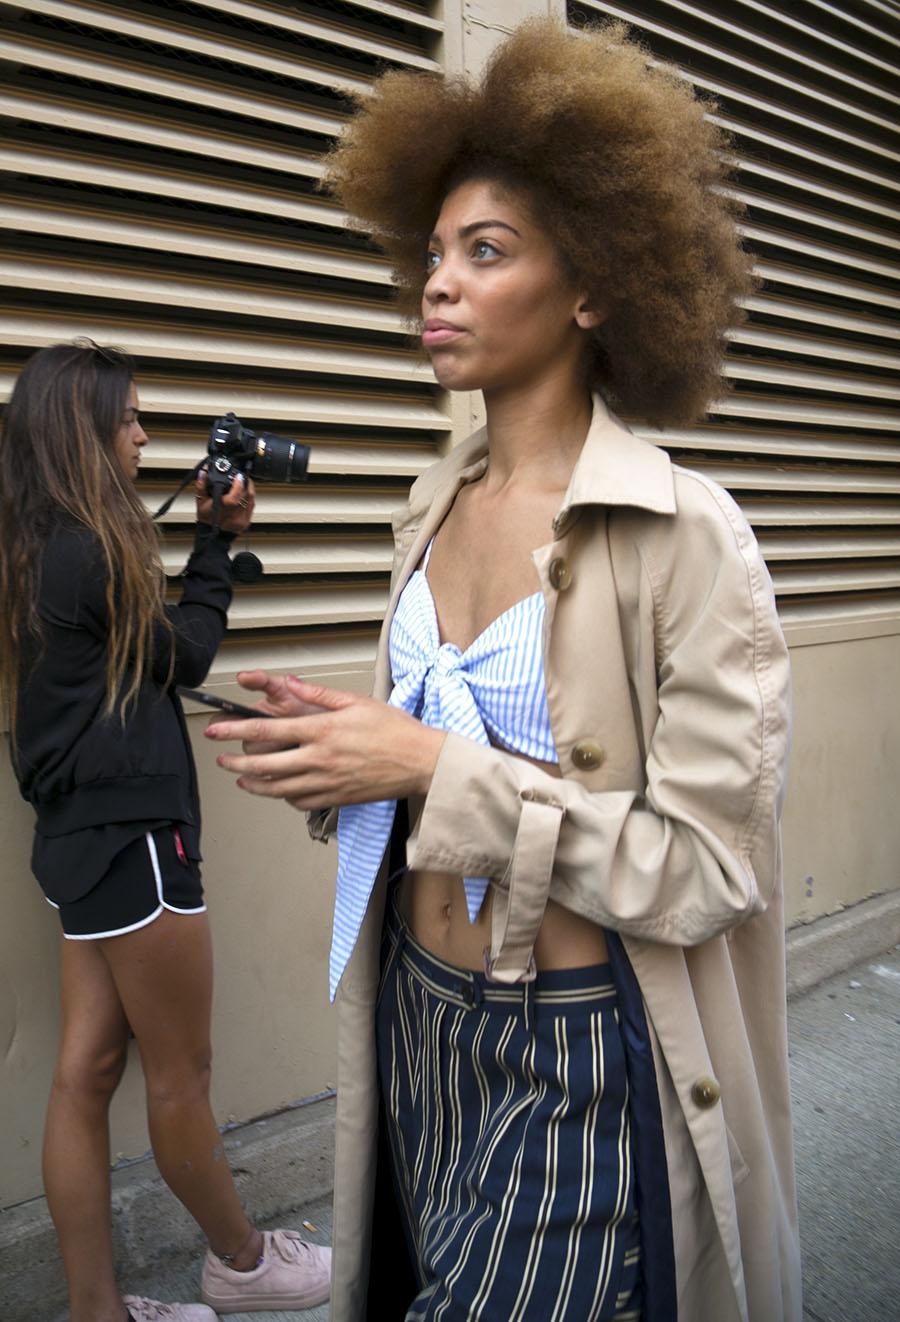 Noa_Baker_street_fashion_photography_new_york_middrift_top